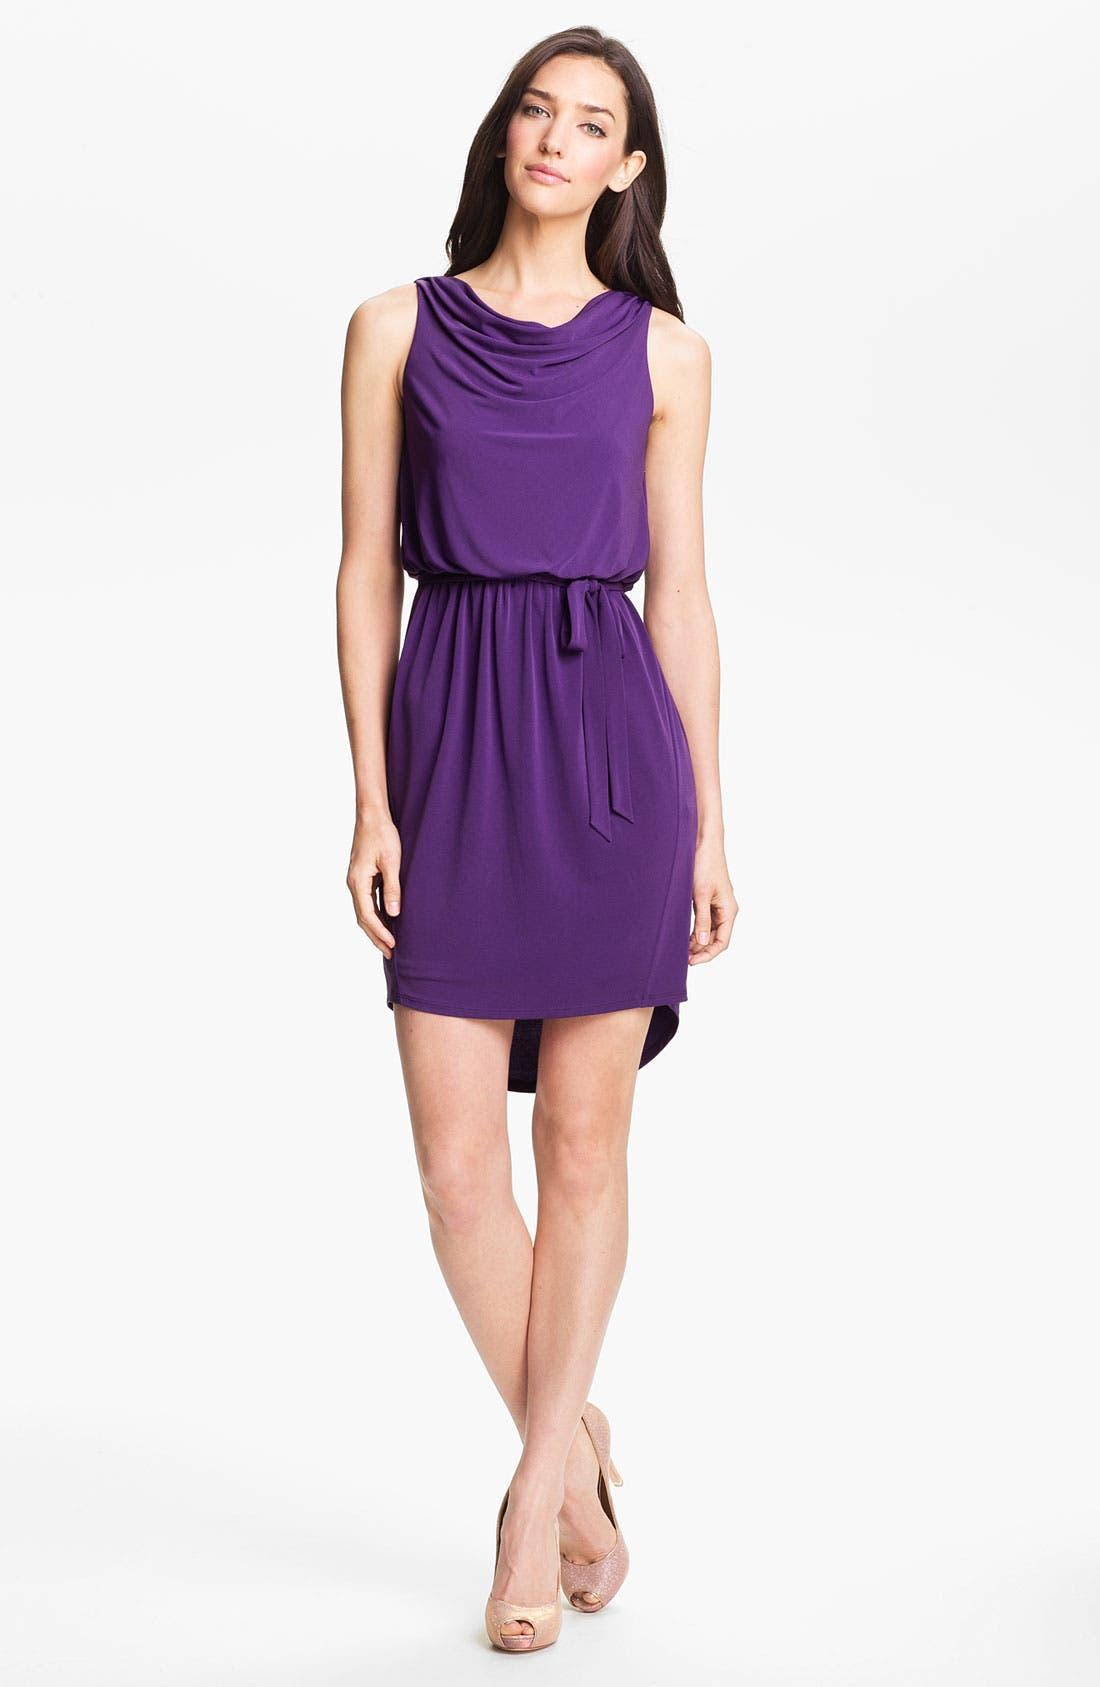 Alternate Image 1 Selected - Jessica Simpson Cowl Neck High/Low Blouson Dress